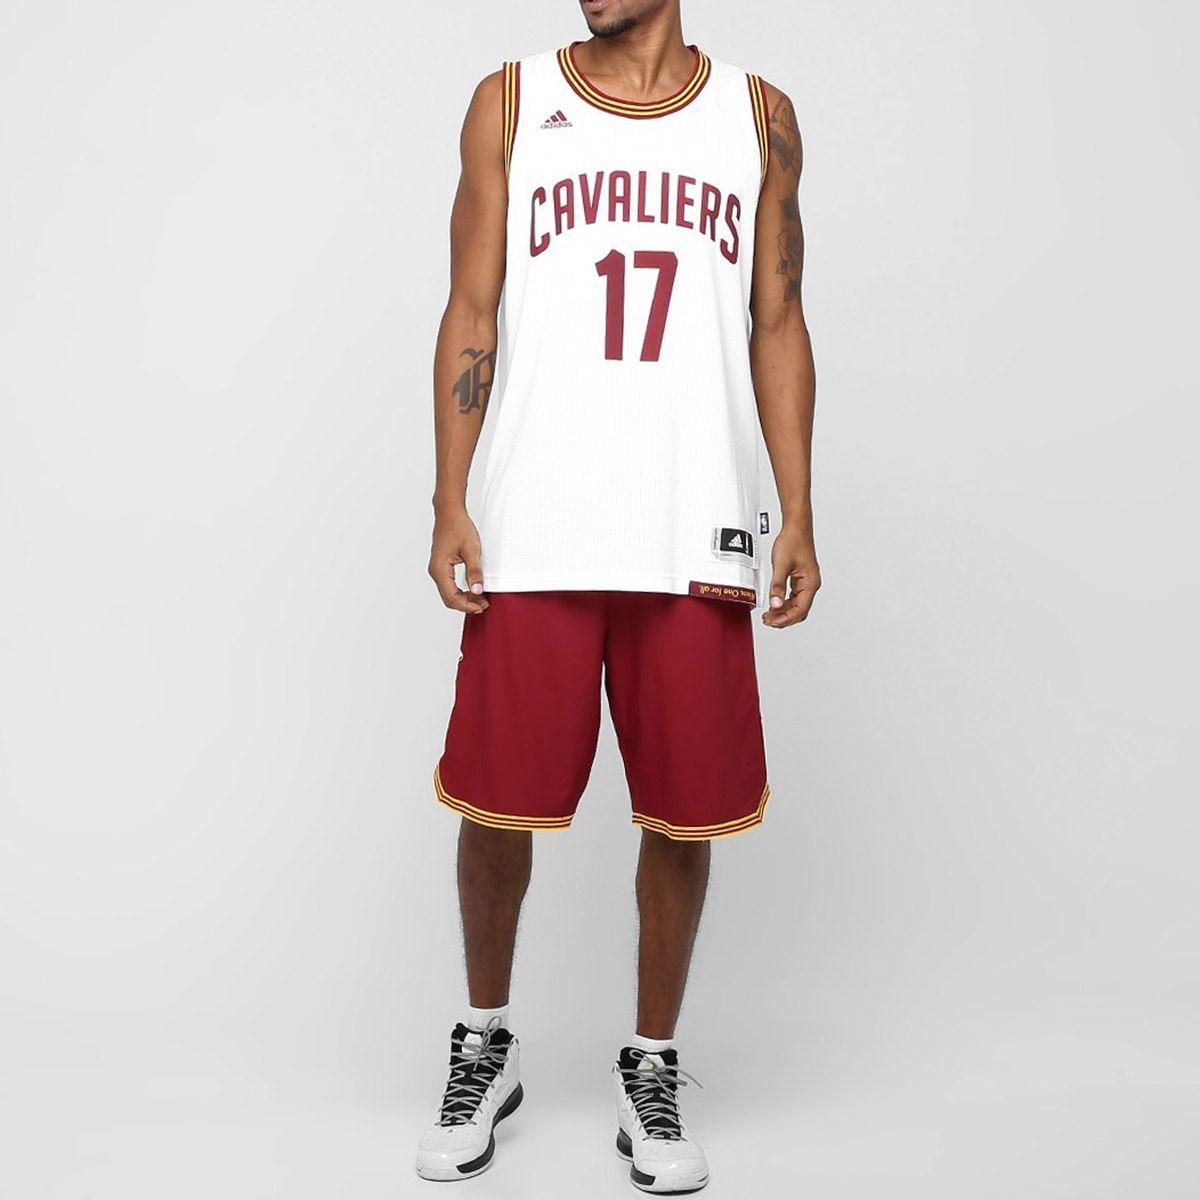 c4032fbc497 Regata adidas Swingman Nba Cleveland Cavaliers 17 Varejão Nf - R ...